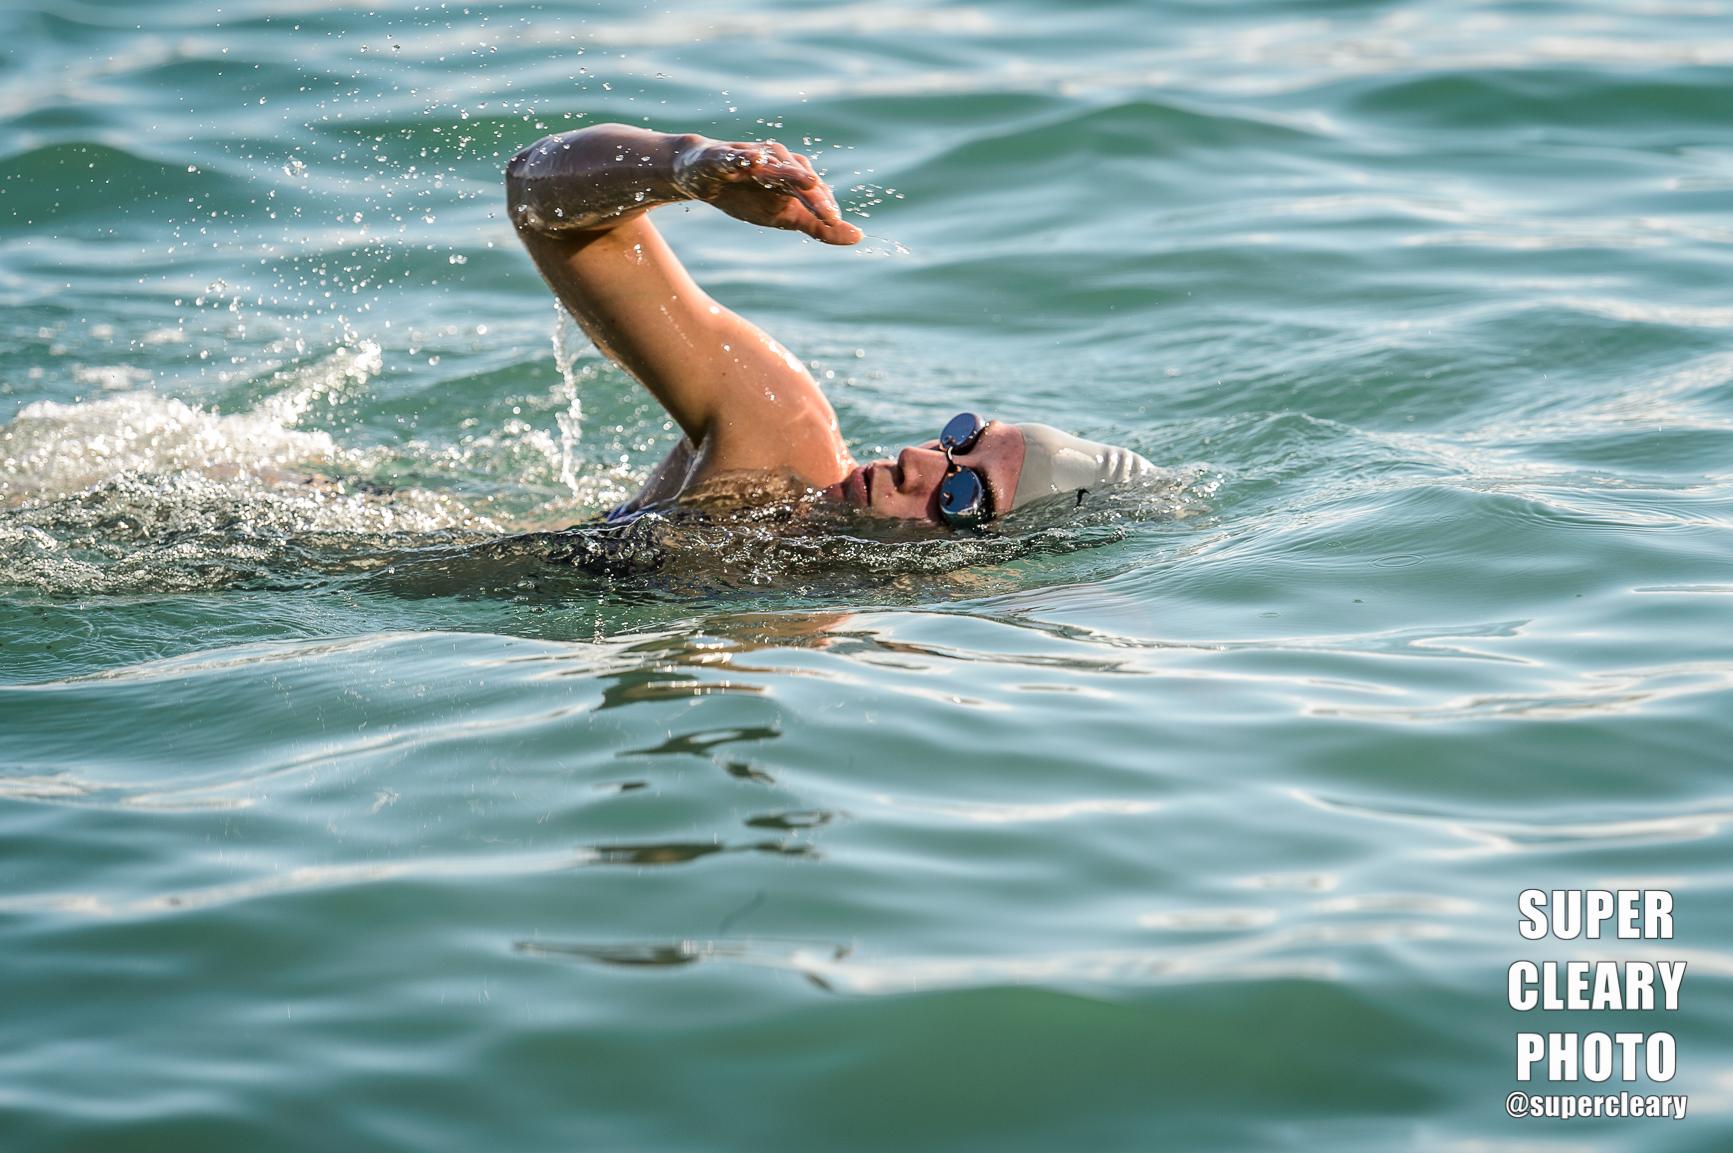 Chelsie Morter during the Sit-Shoot-Swim event. Nikon D4, Nikon 70-200, 1/1000th, f4.0, ISO 100